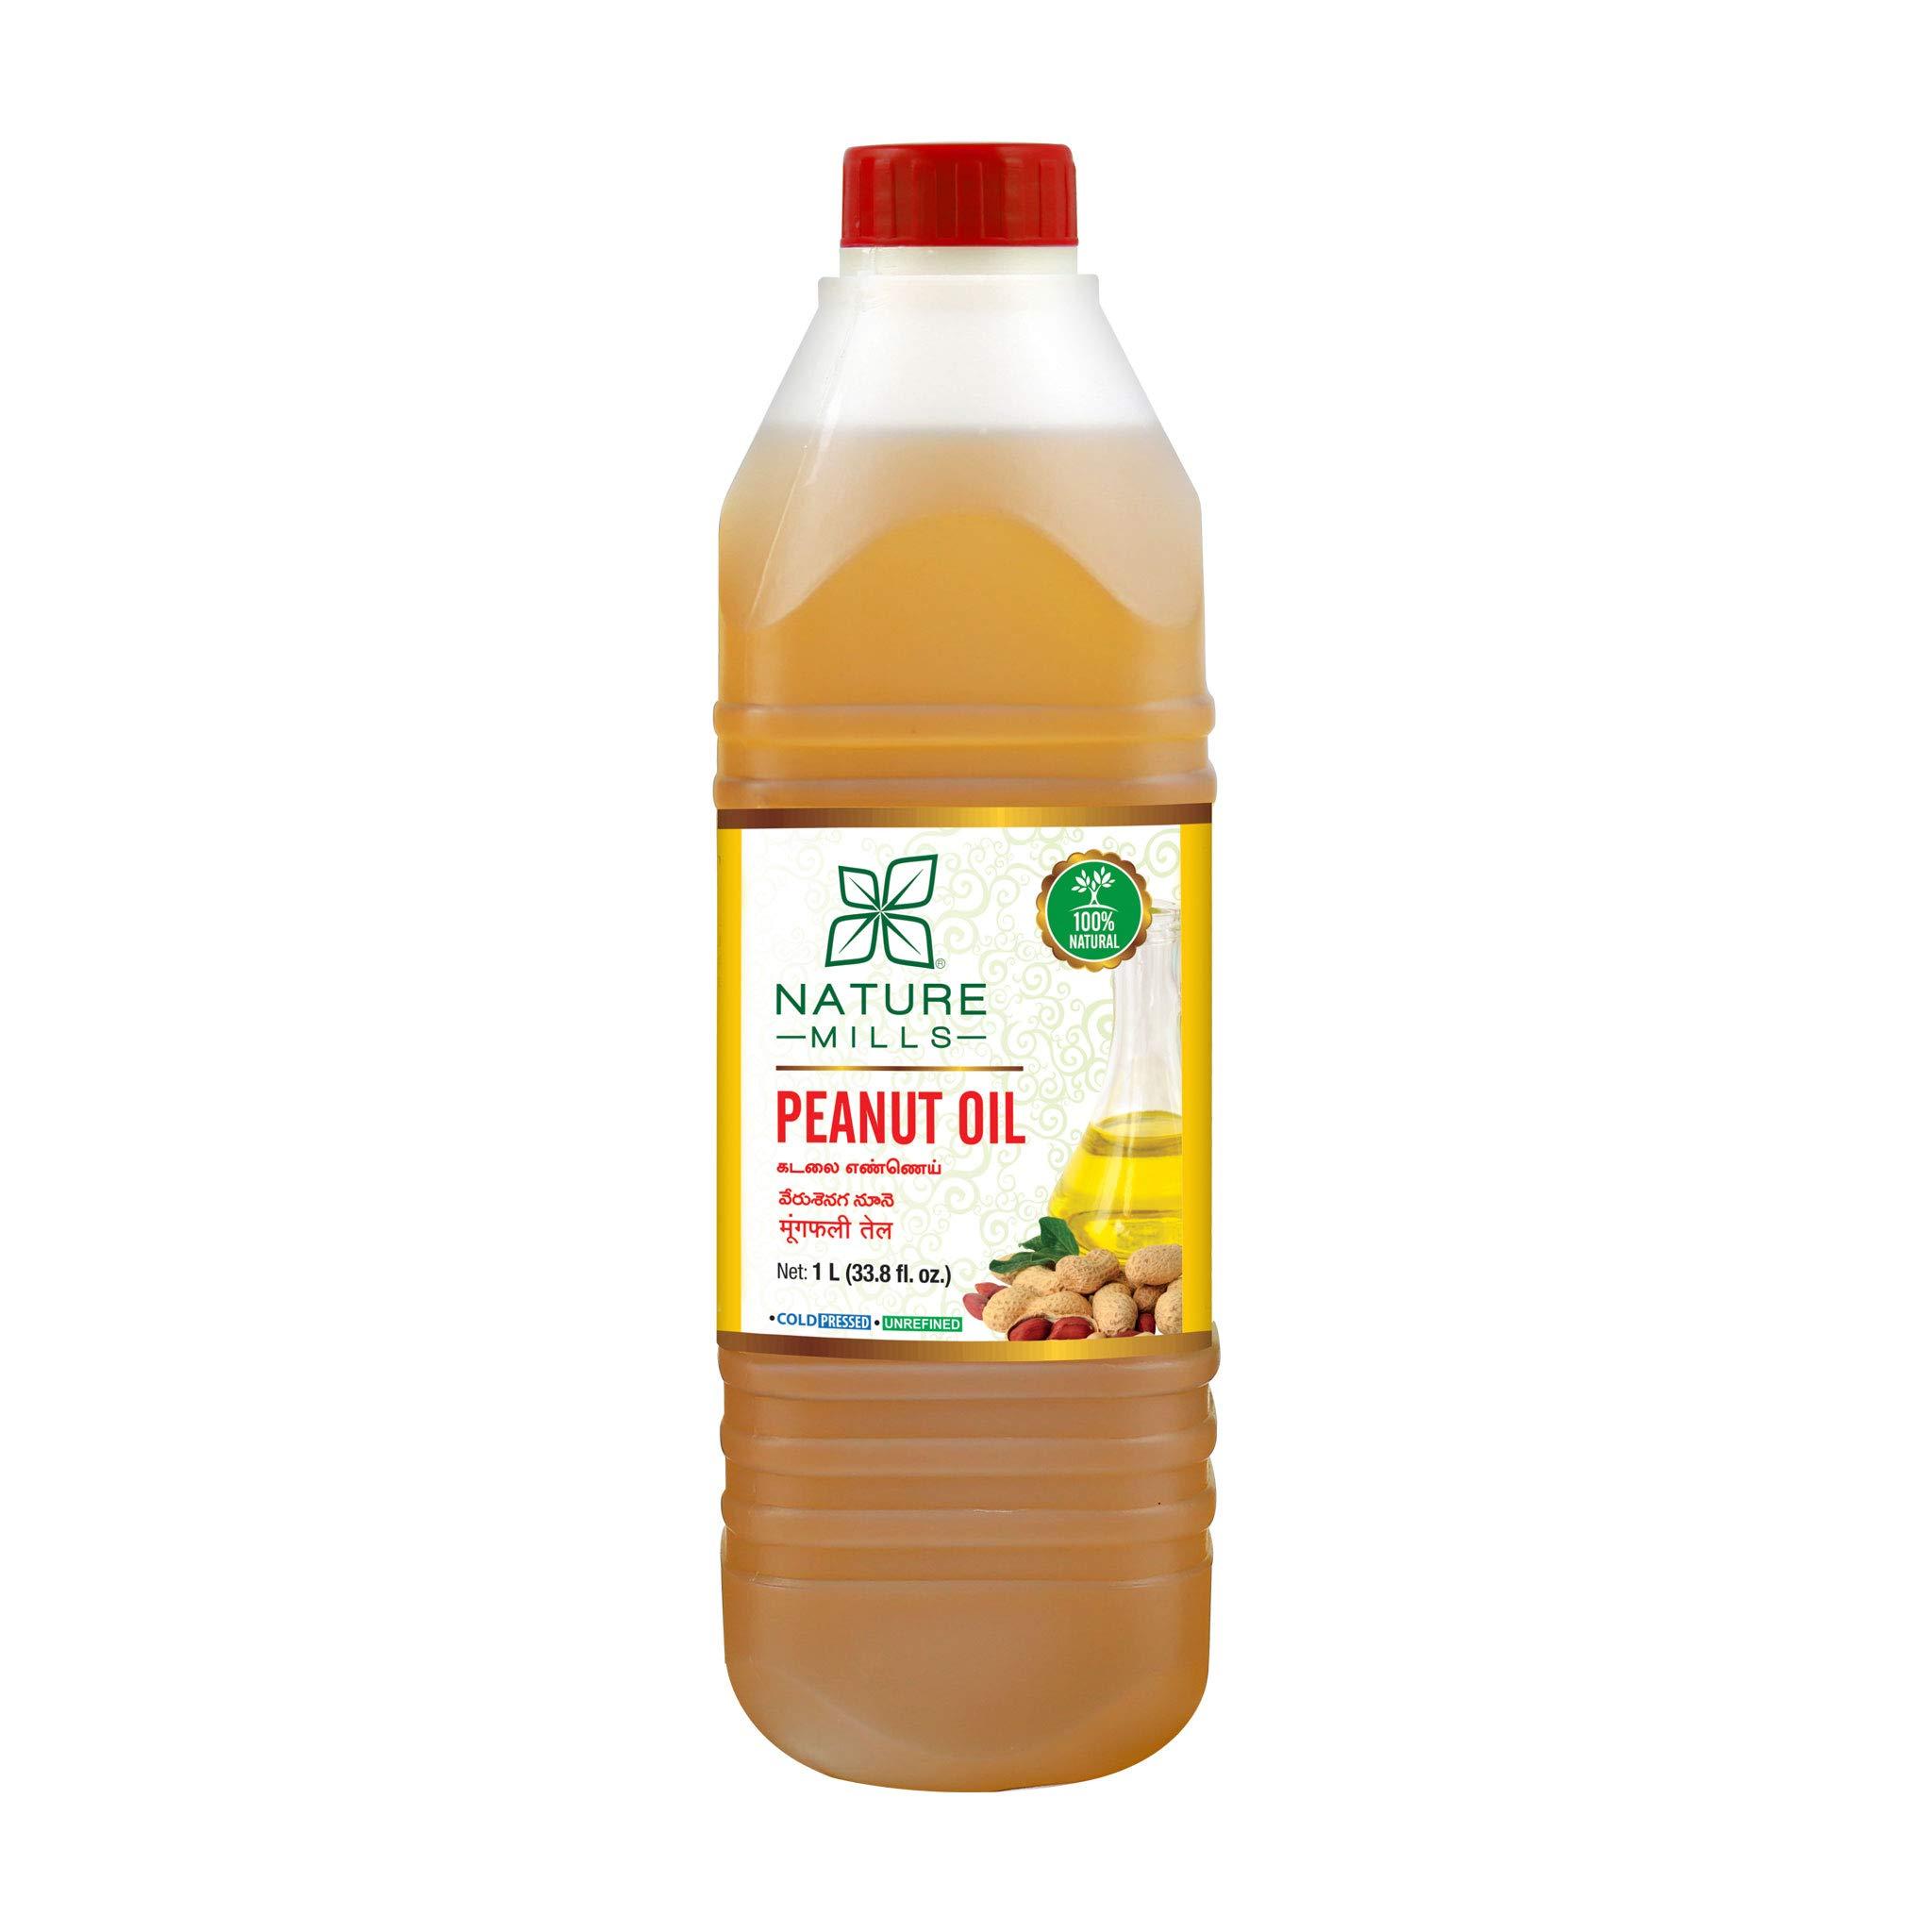 Natural Peanut Oil - 1 Liter - 33.8 Fl.Oz